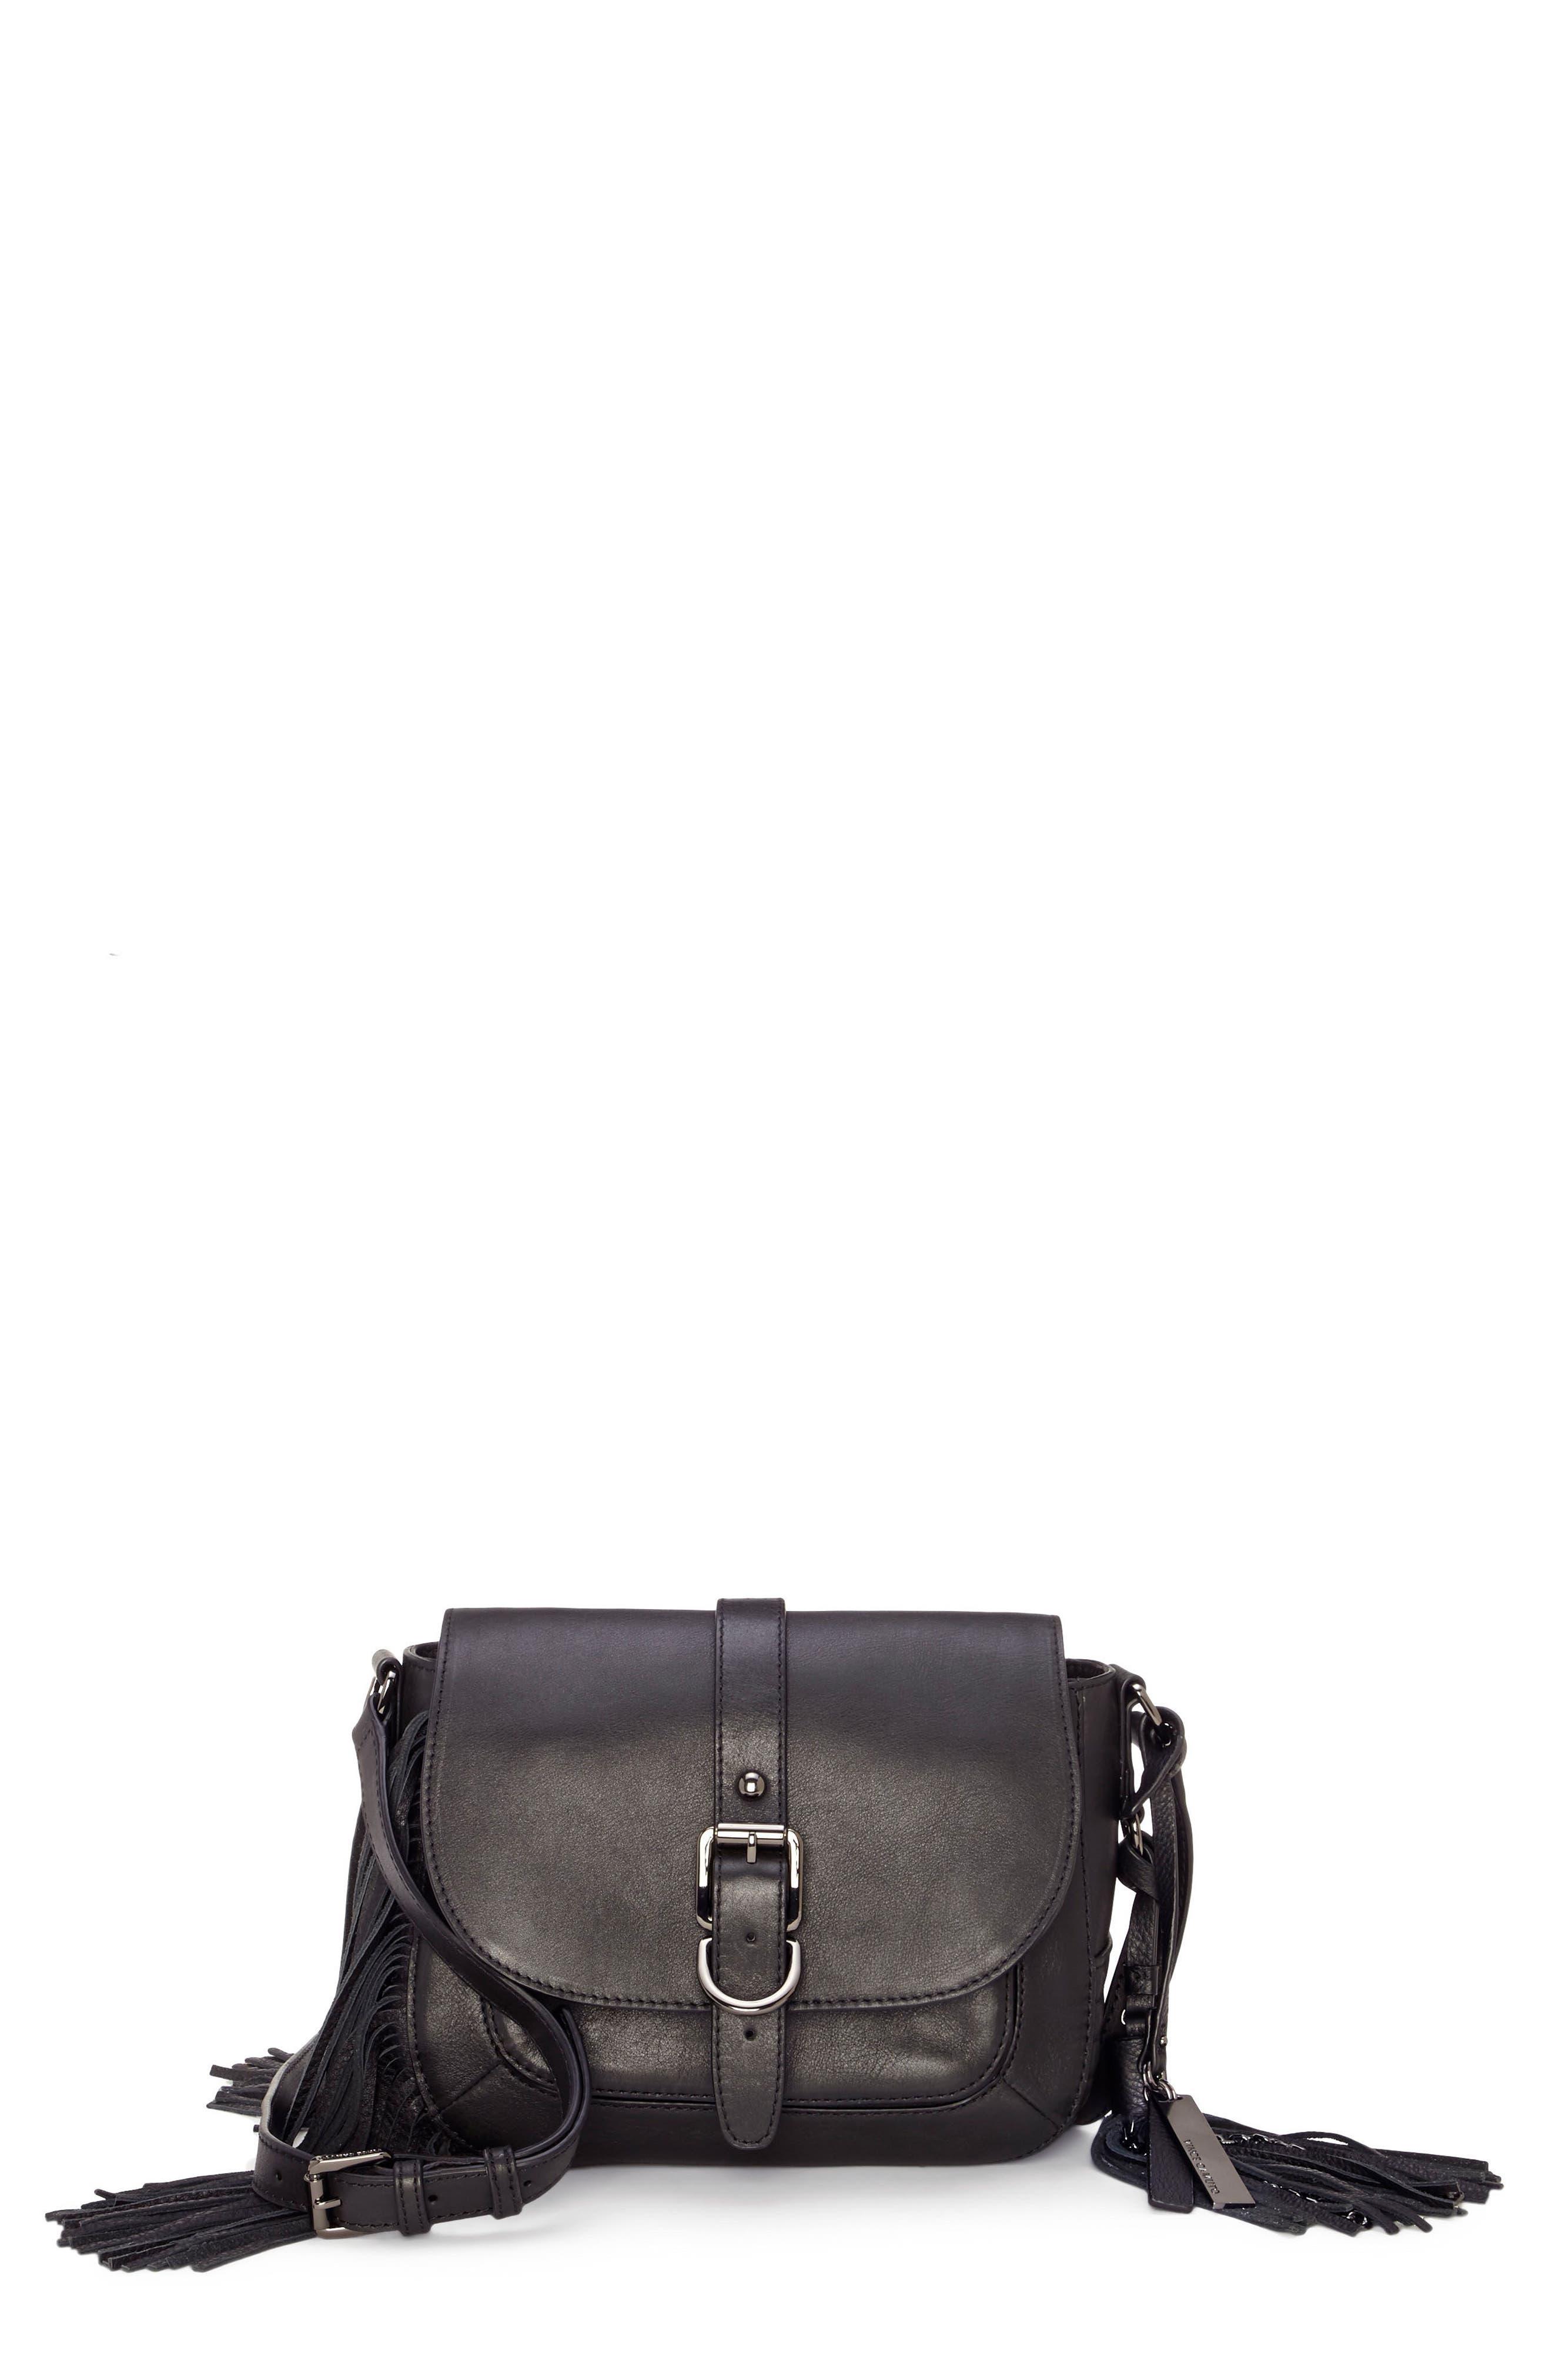 Hil Leather Crossbody Bag,                         Main,                         color, 002